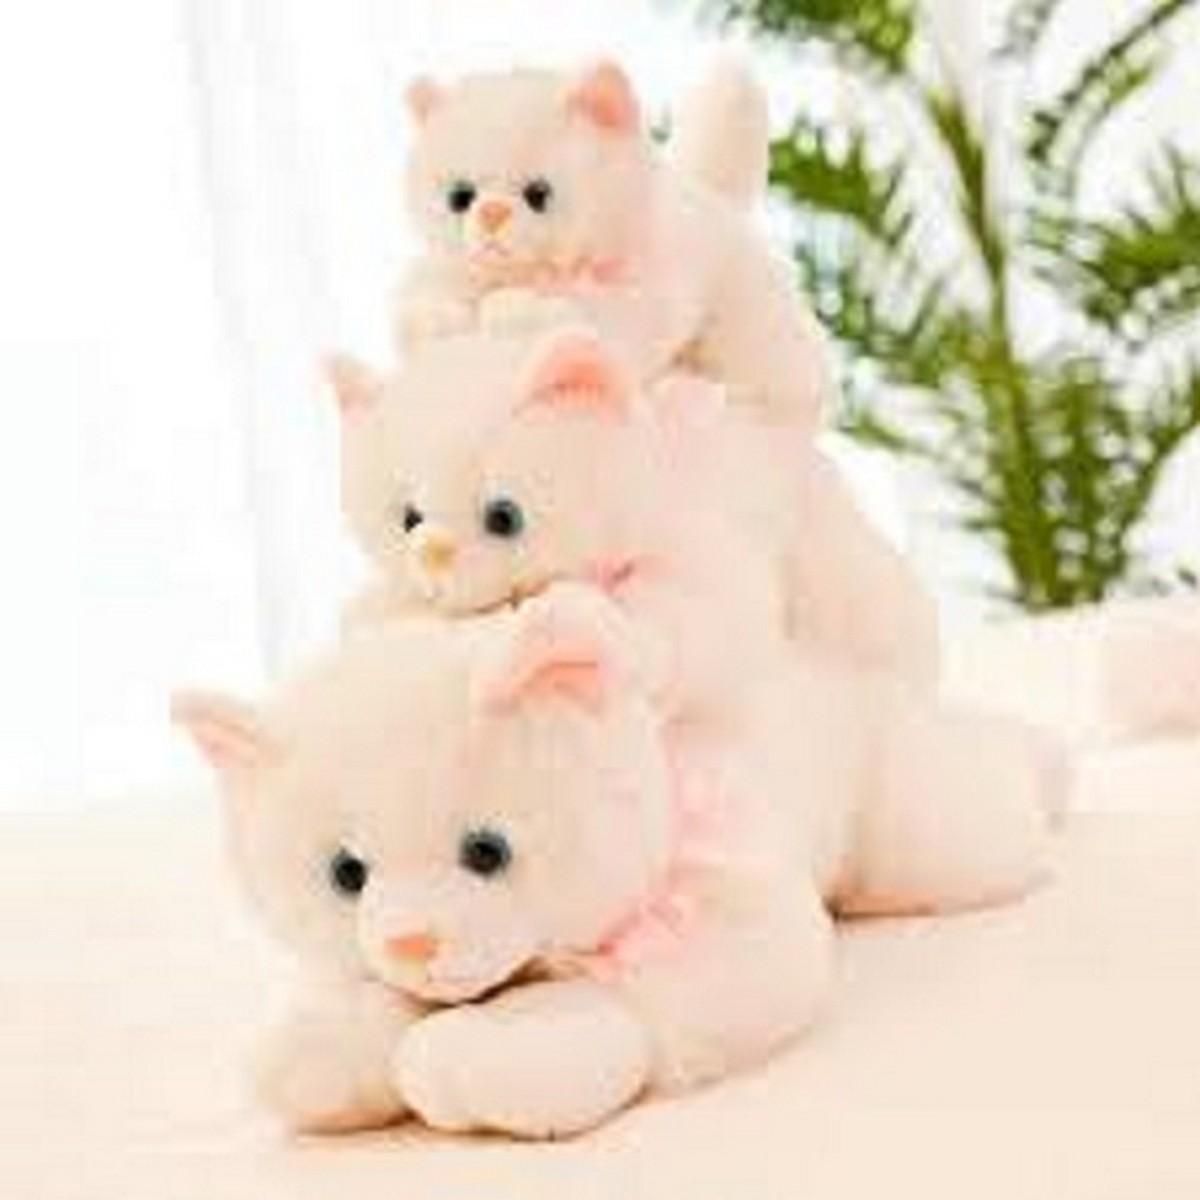 APC Realistic Kitten Cat Lifelike Plush Kitten Toy Plushie Soft Toy Stuffed Animal Lovely Cat Cartoon Animal Plush Soft Doll Toy Pillow For Girl Kids Birthday Gifts